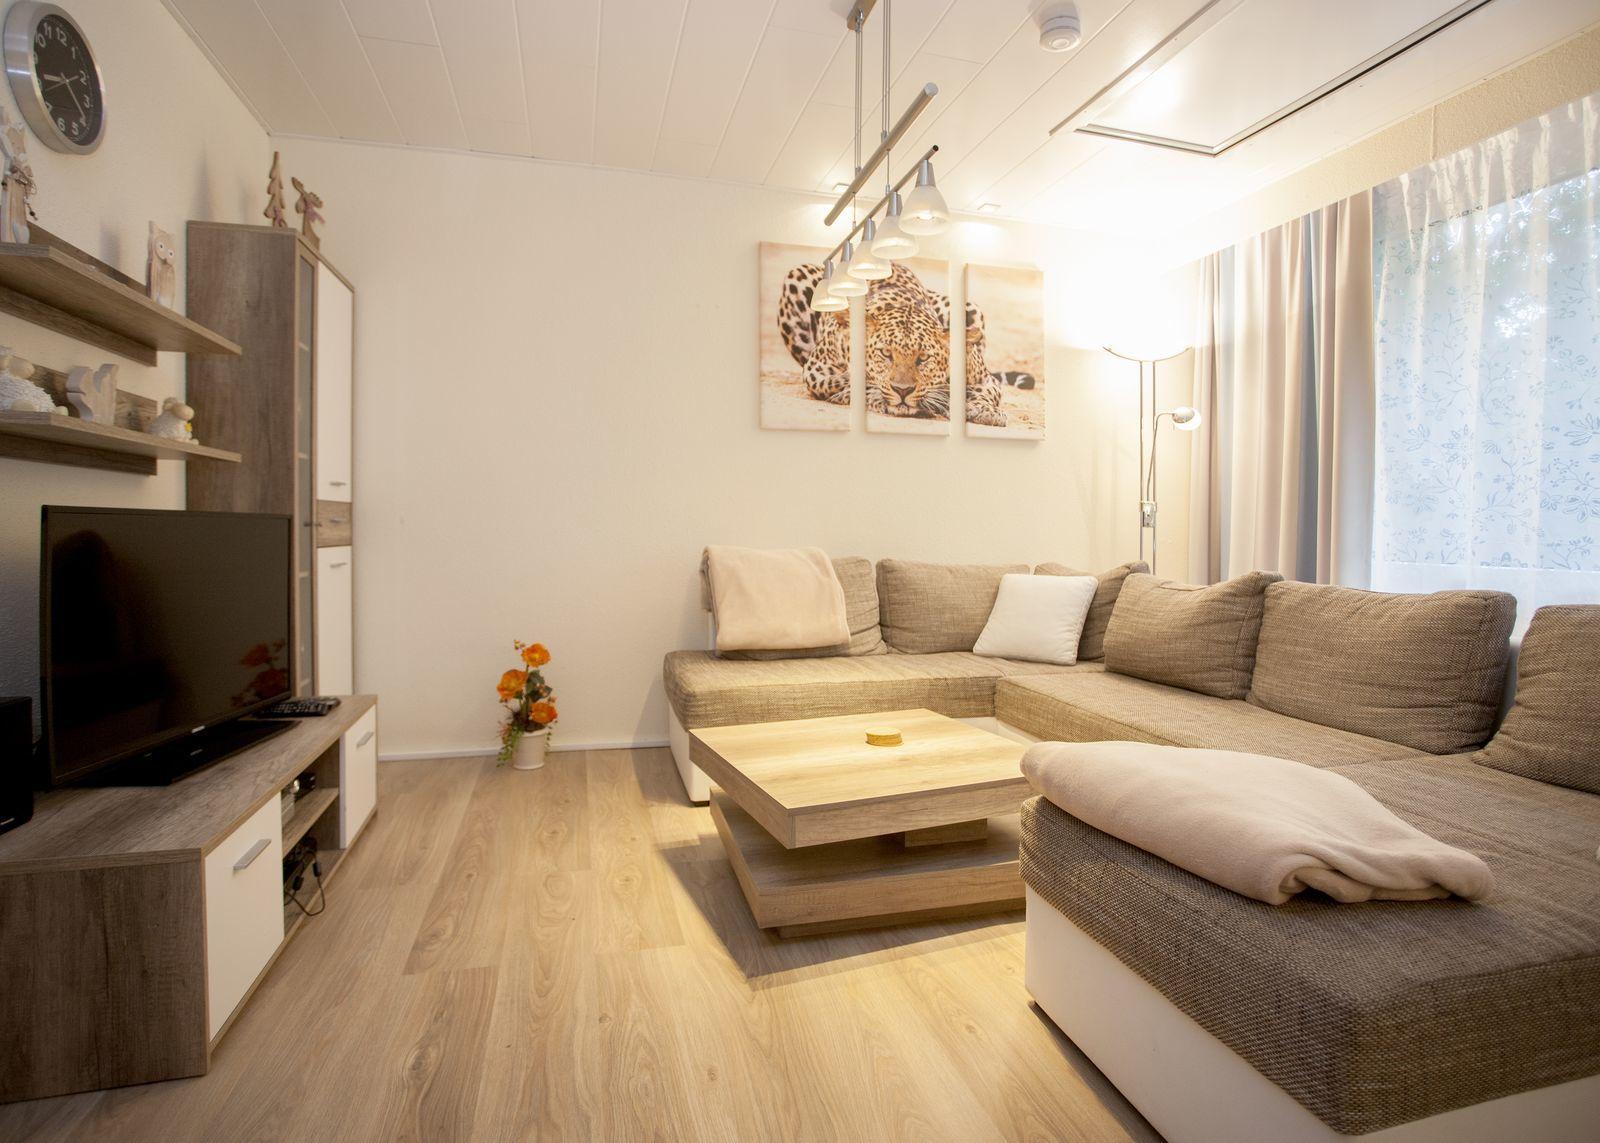 Appartement - Am Waltenberg 70-O   Winterberg